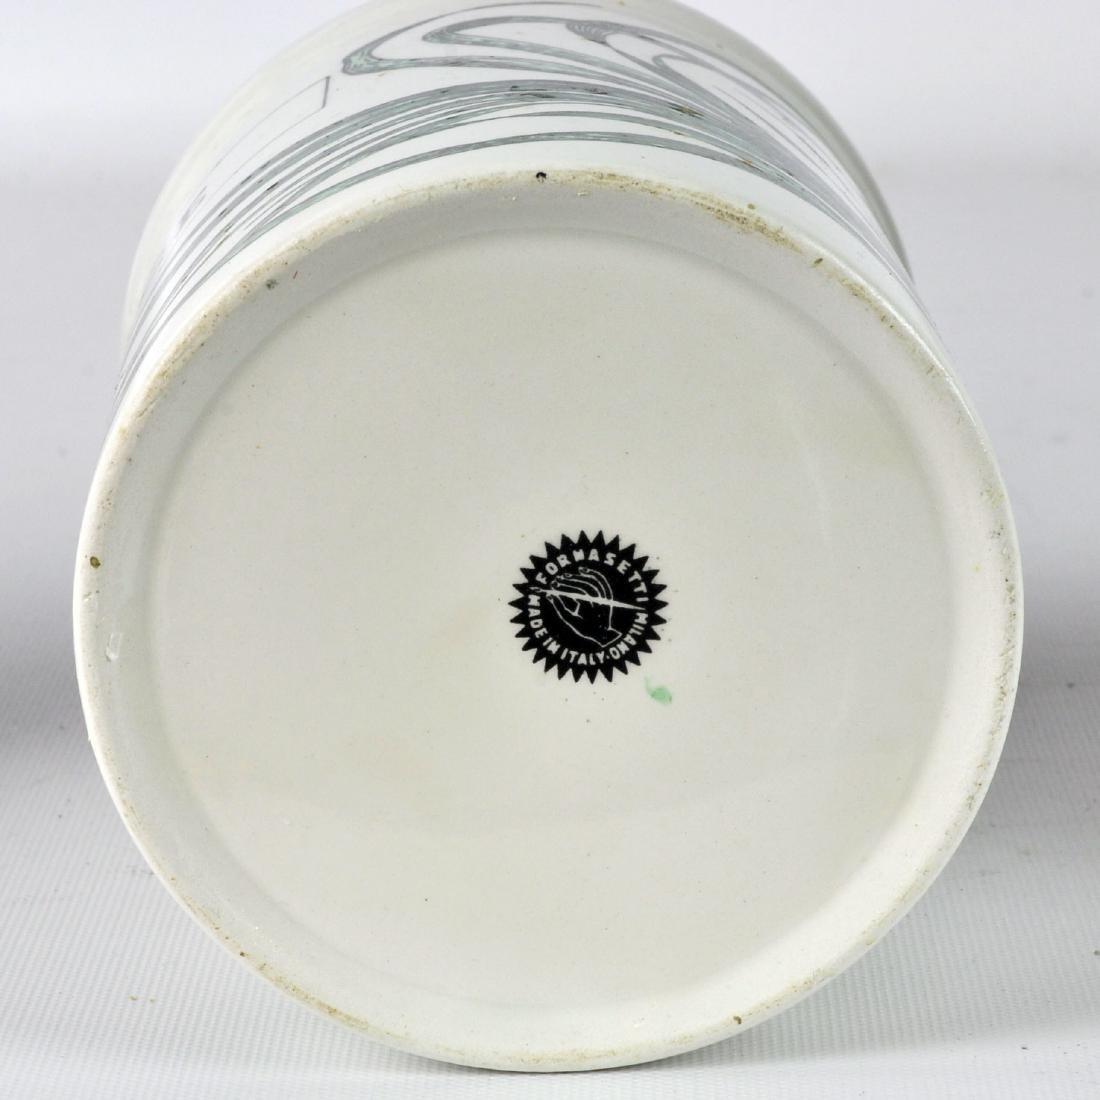 5 Piero Fornasetti Italy Lidded Jars - 5